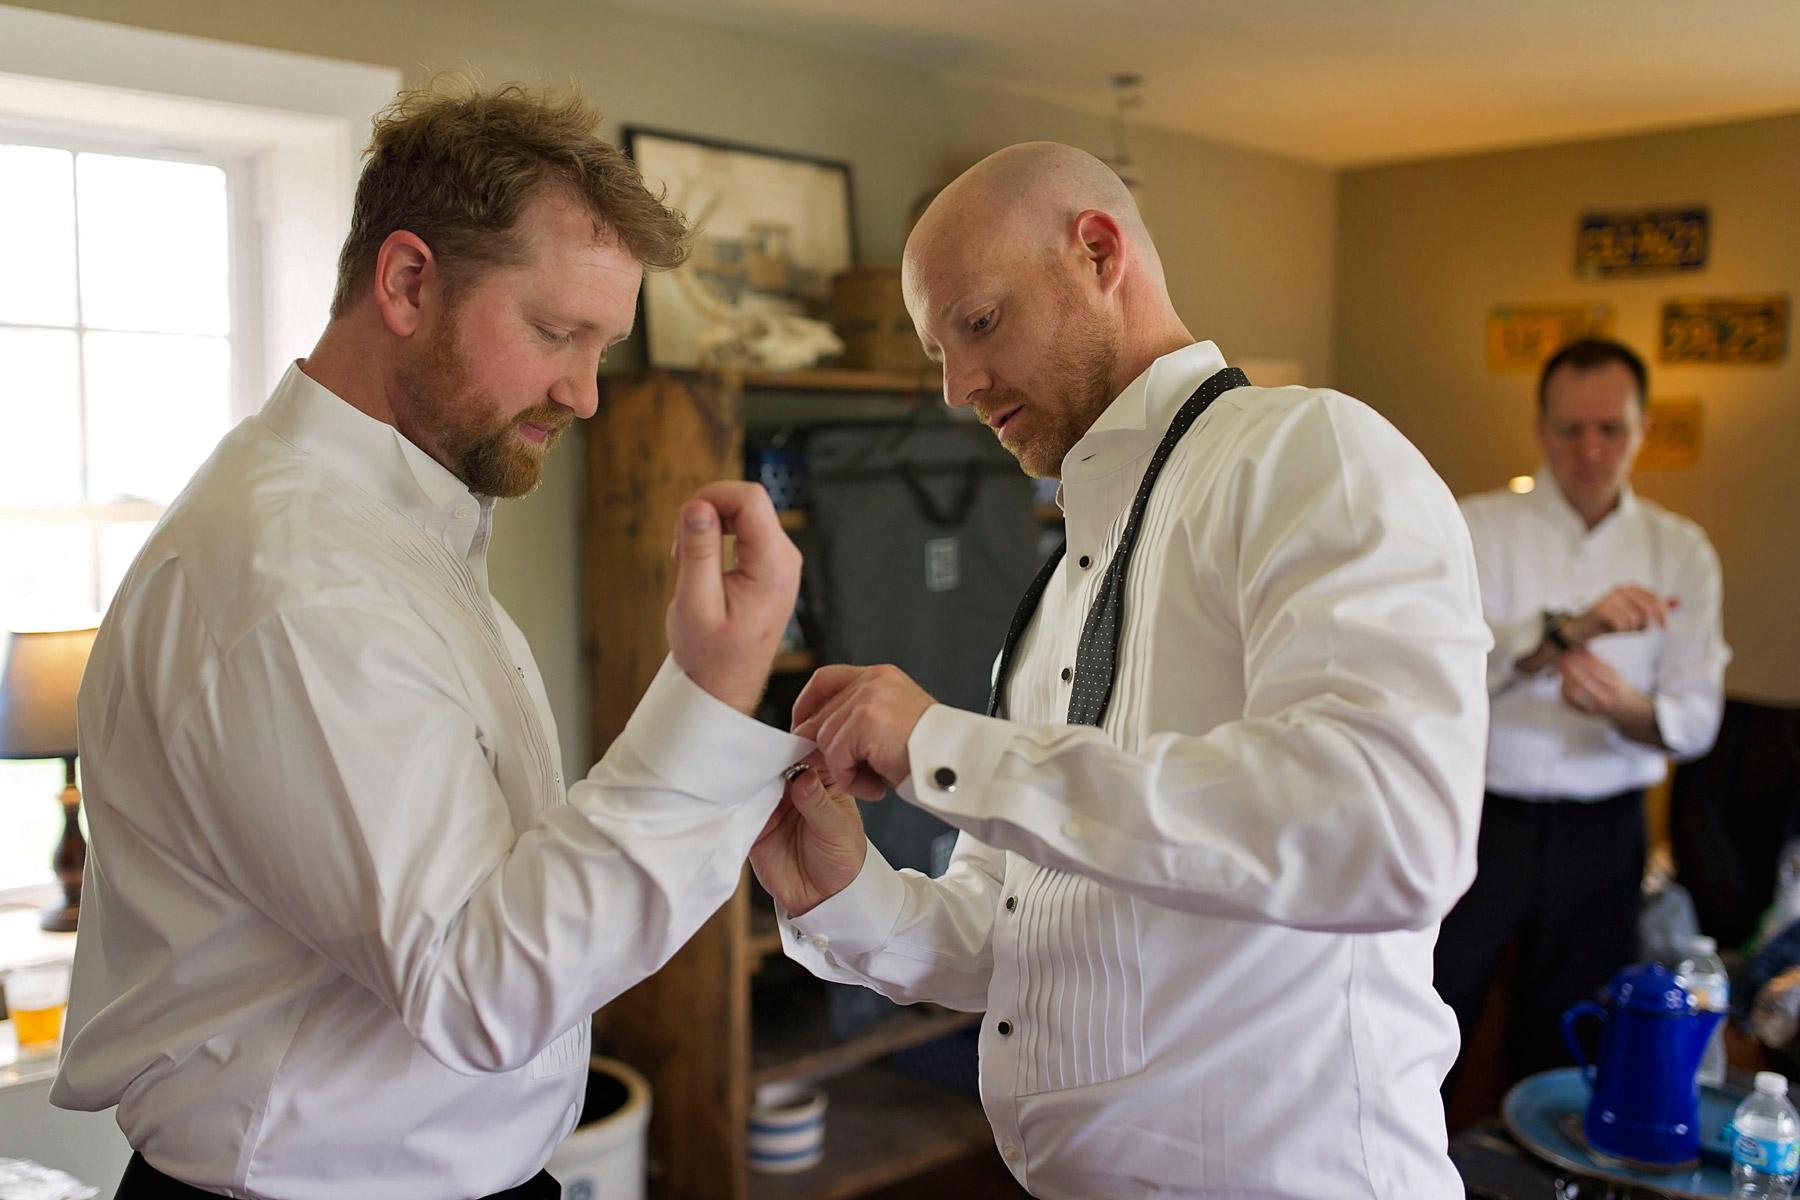 groom helping groomsman wth cuff links